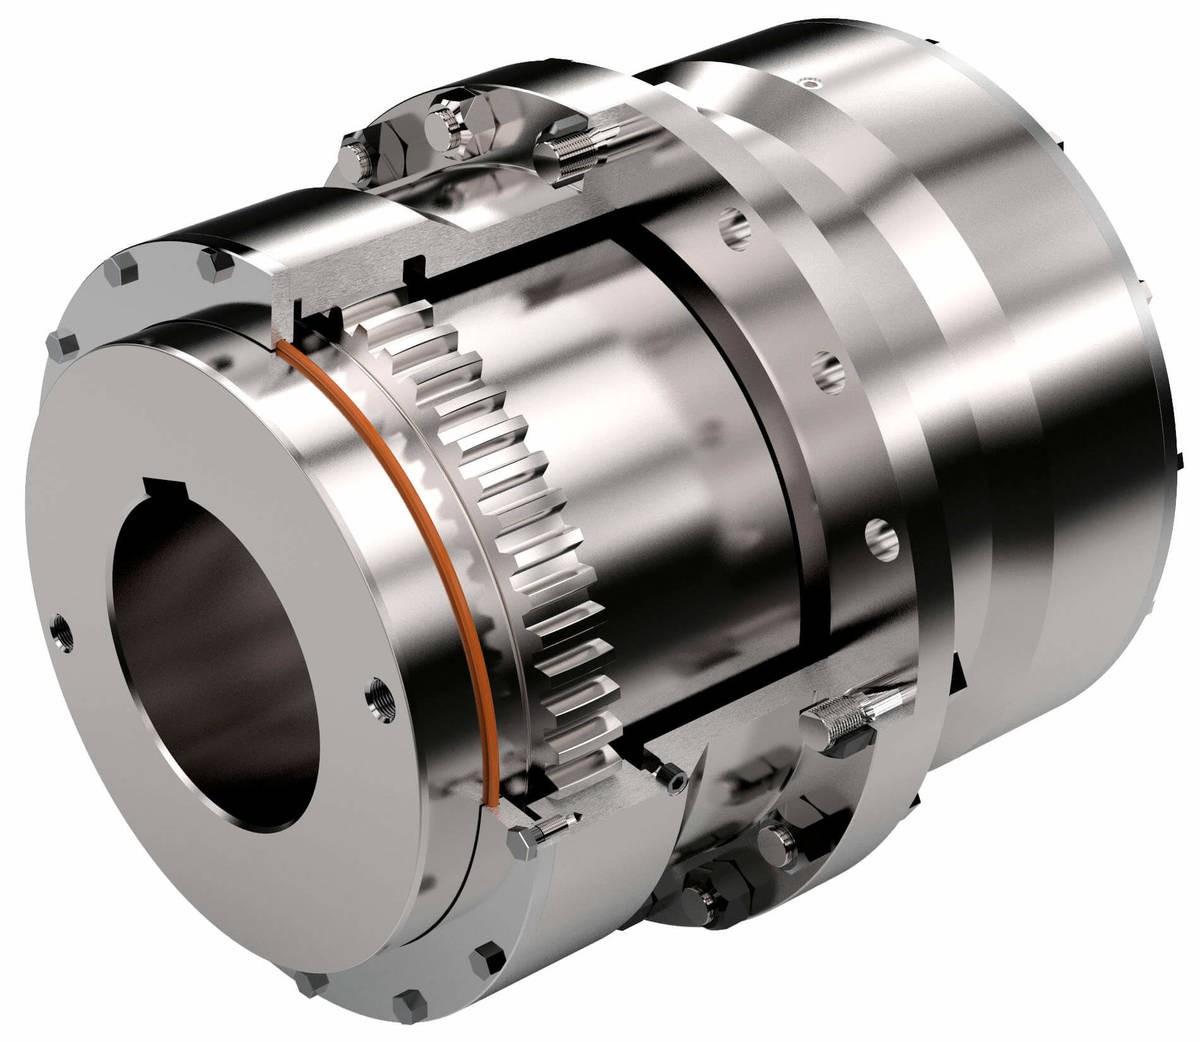 Desch GC  Standard heavy load coupling Image